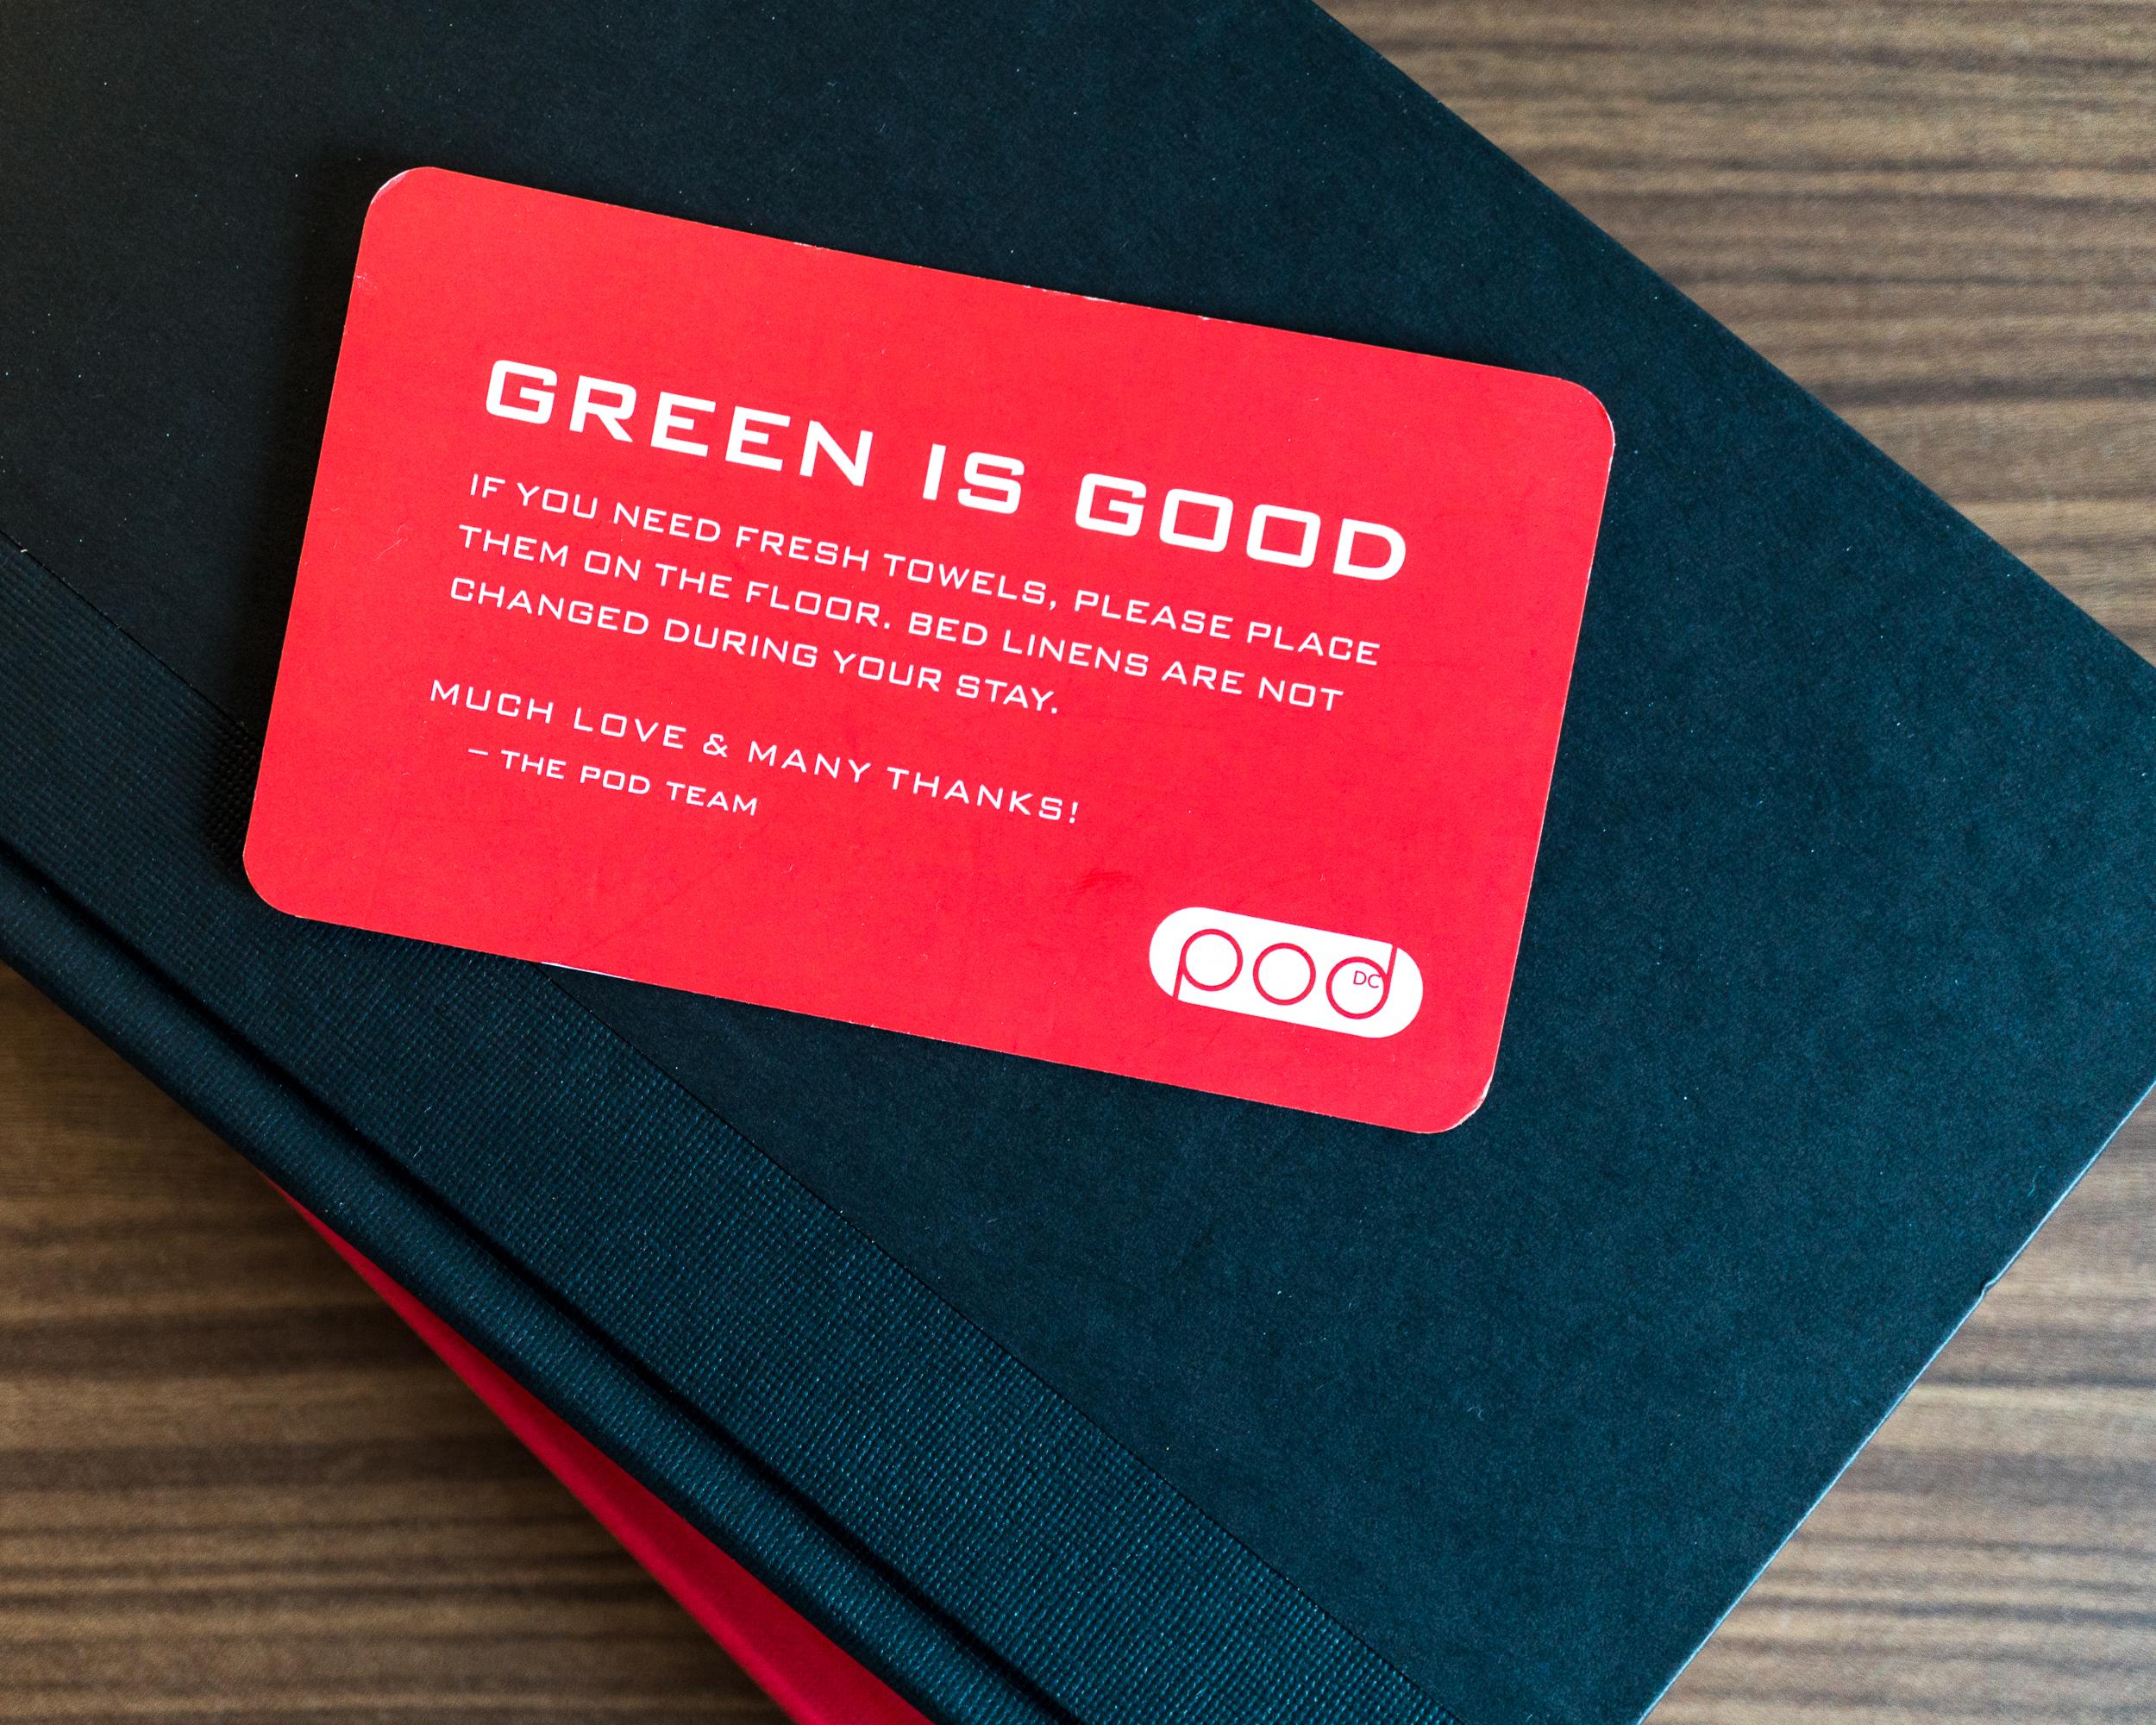 Environmental Awareness Hotel Card Design. Photo @podhoteldc